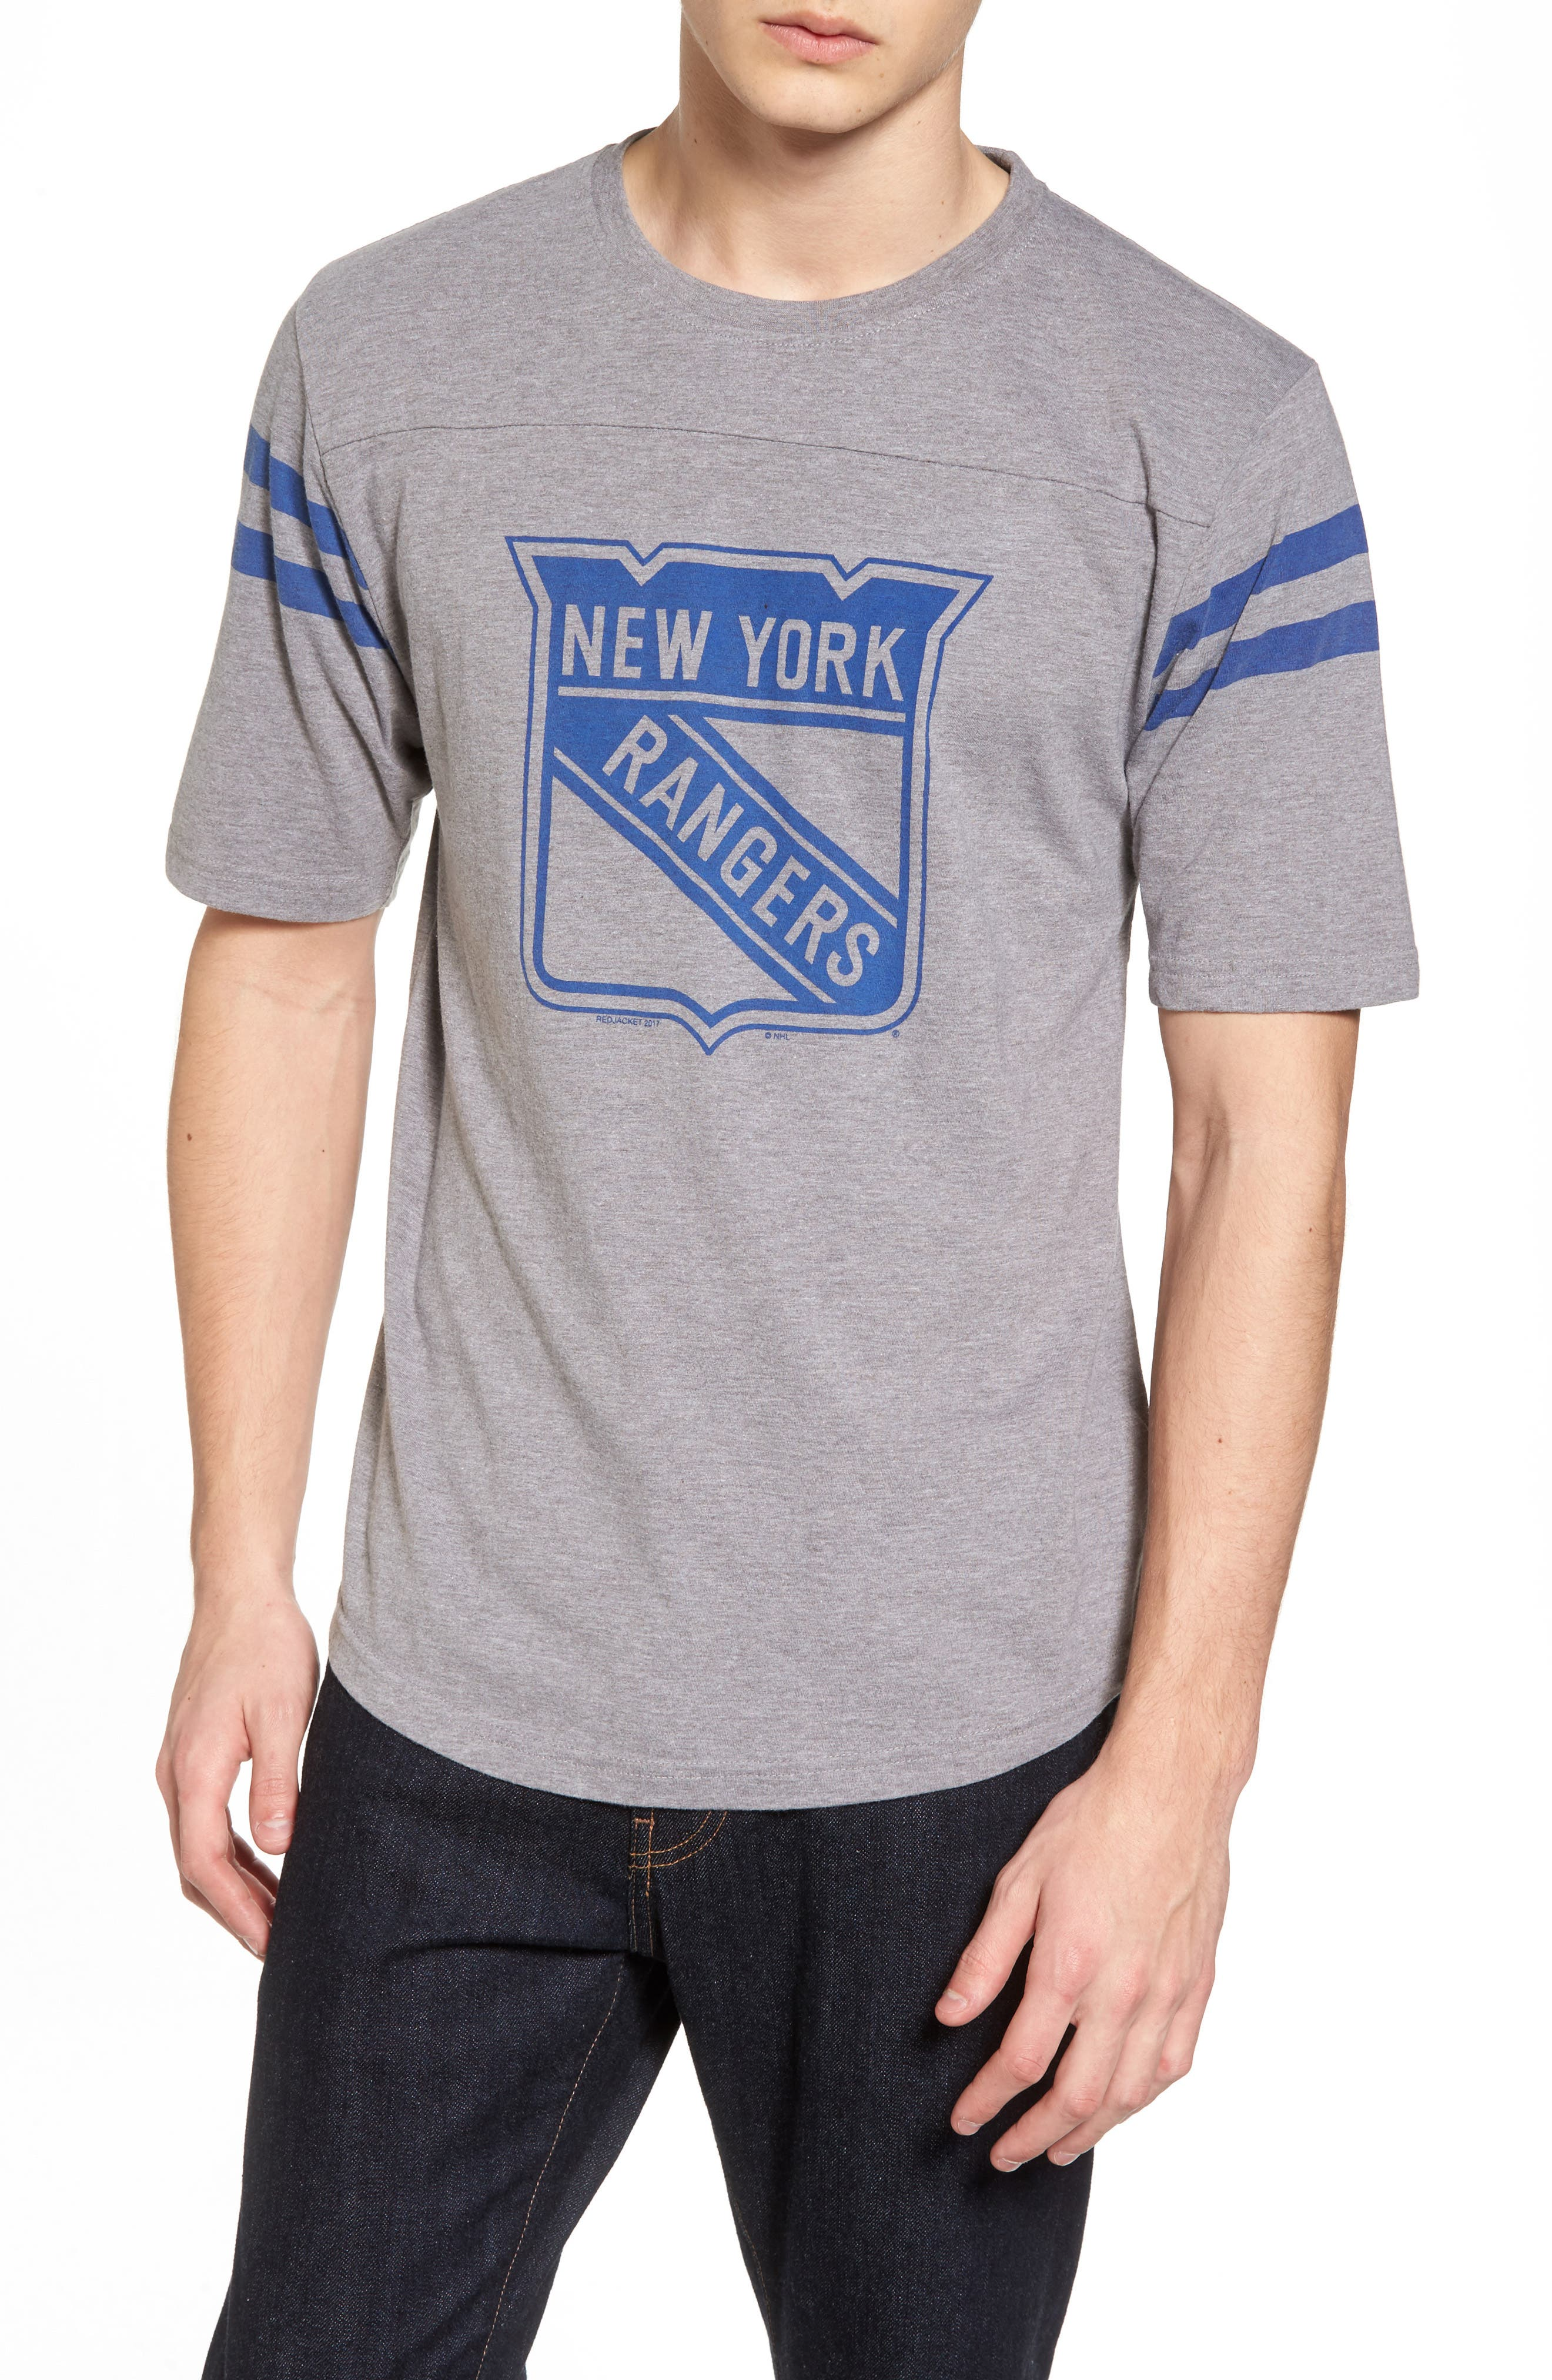 Crosby New York Rangers T-Shirt,                         Main,                         color, 073